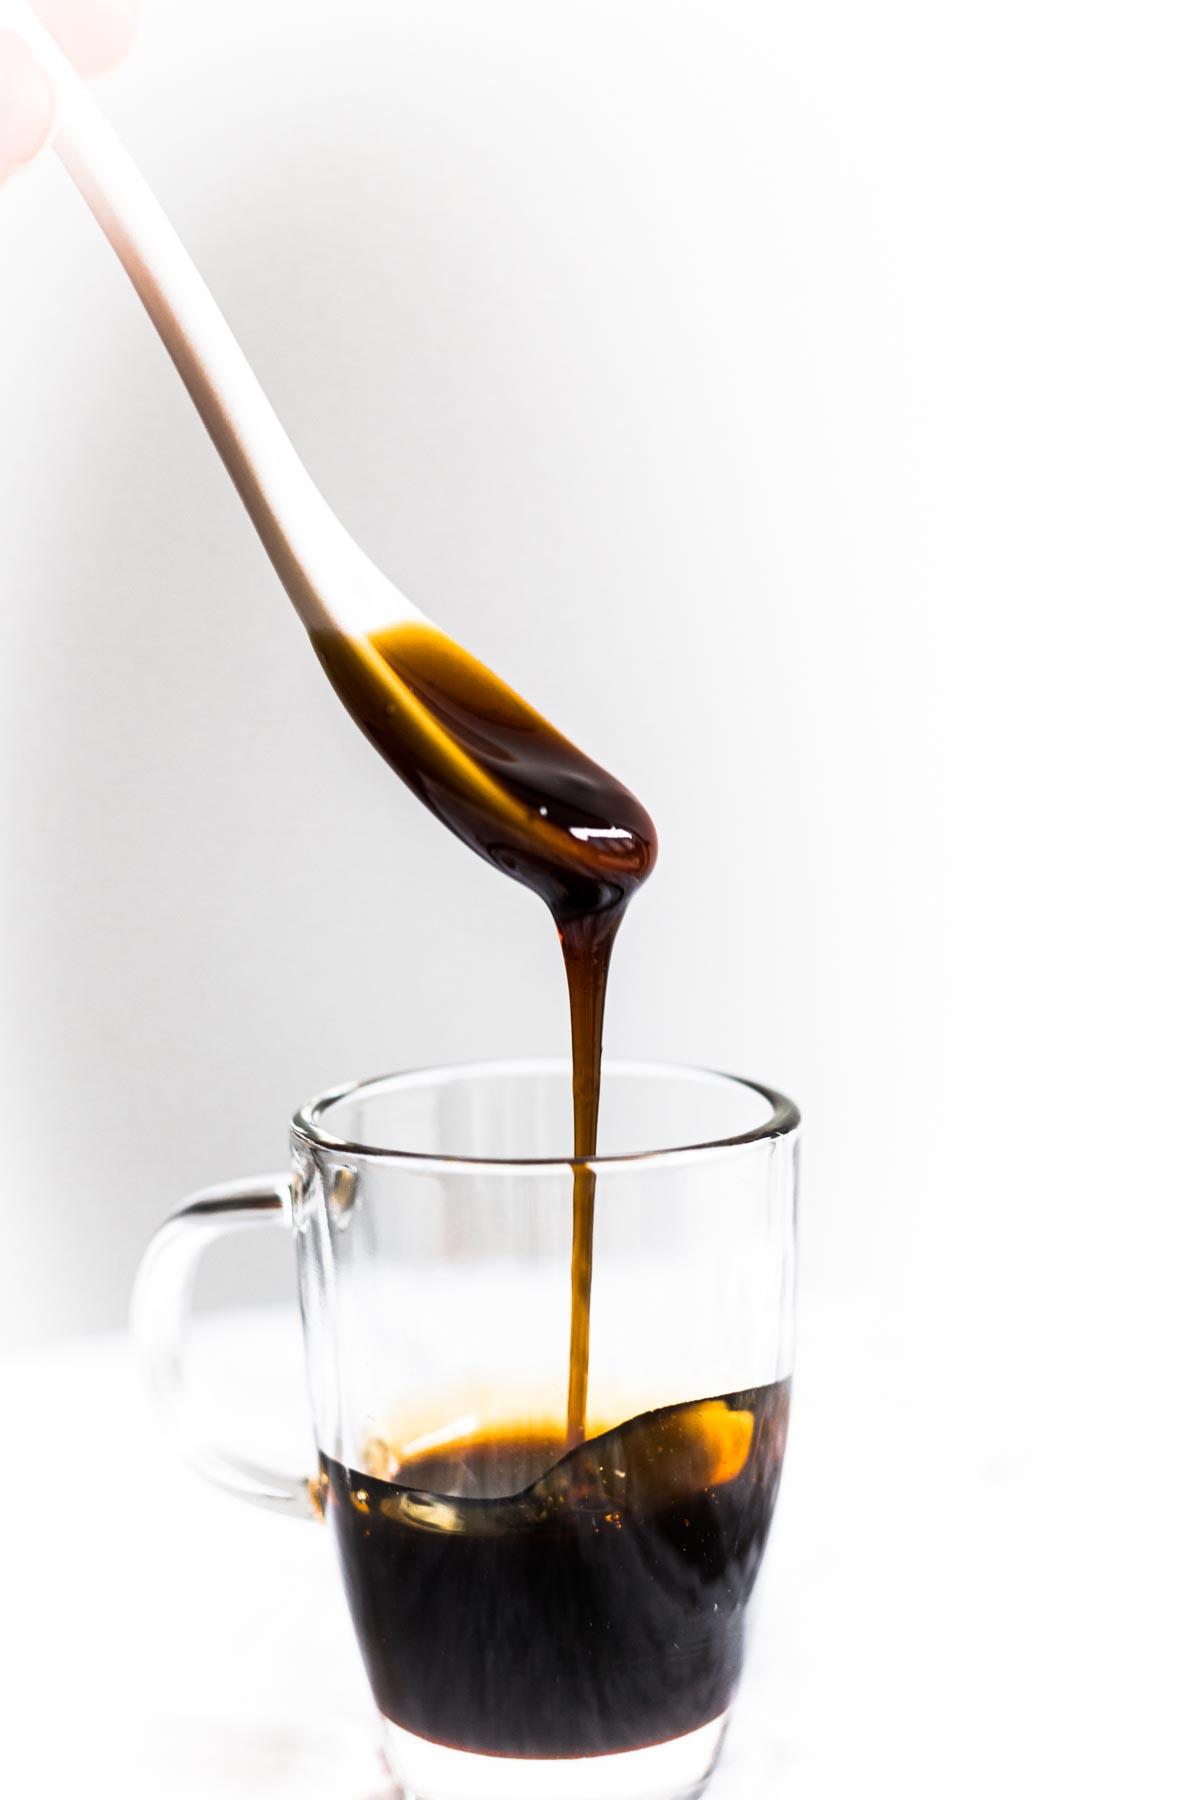 Sugar-Free Sugar liquid Yacon Syrup